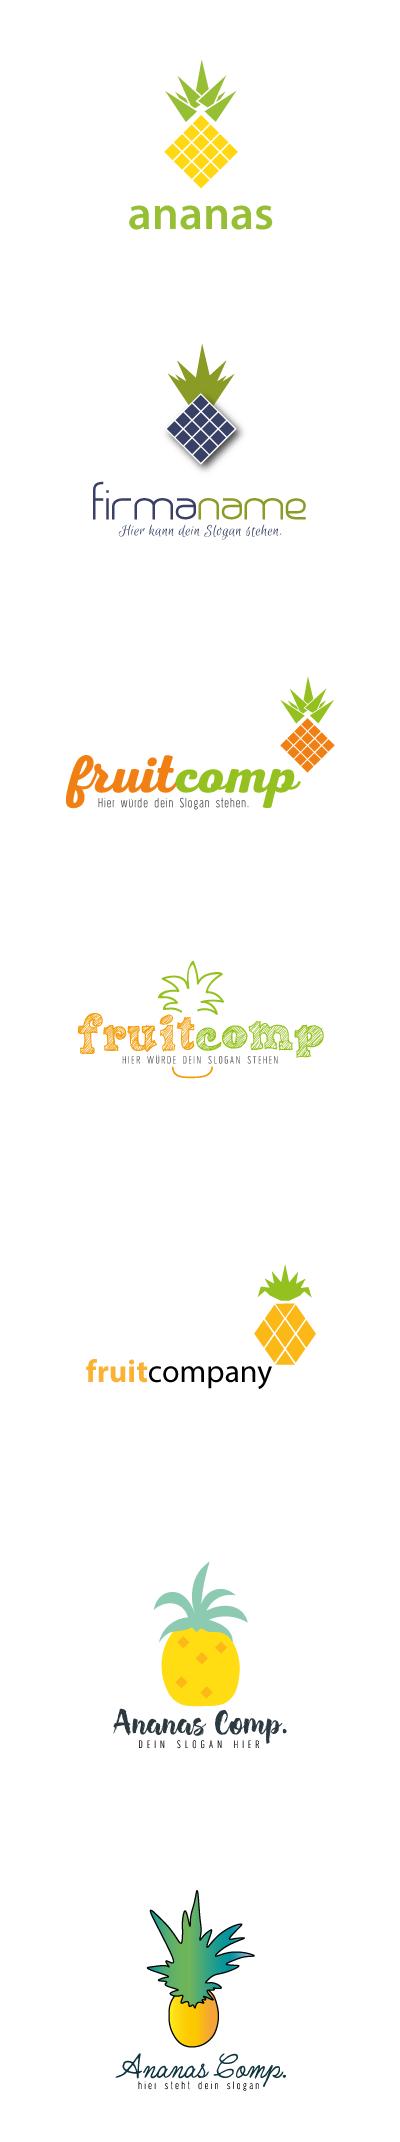 freie-logos-ananas, freie logos, früchte, ananas, logos fürs kleine budget, günstige freie logos, wildpeppermint-design.de